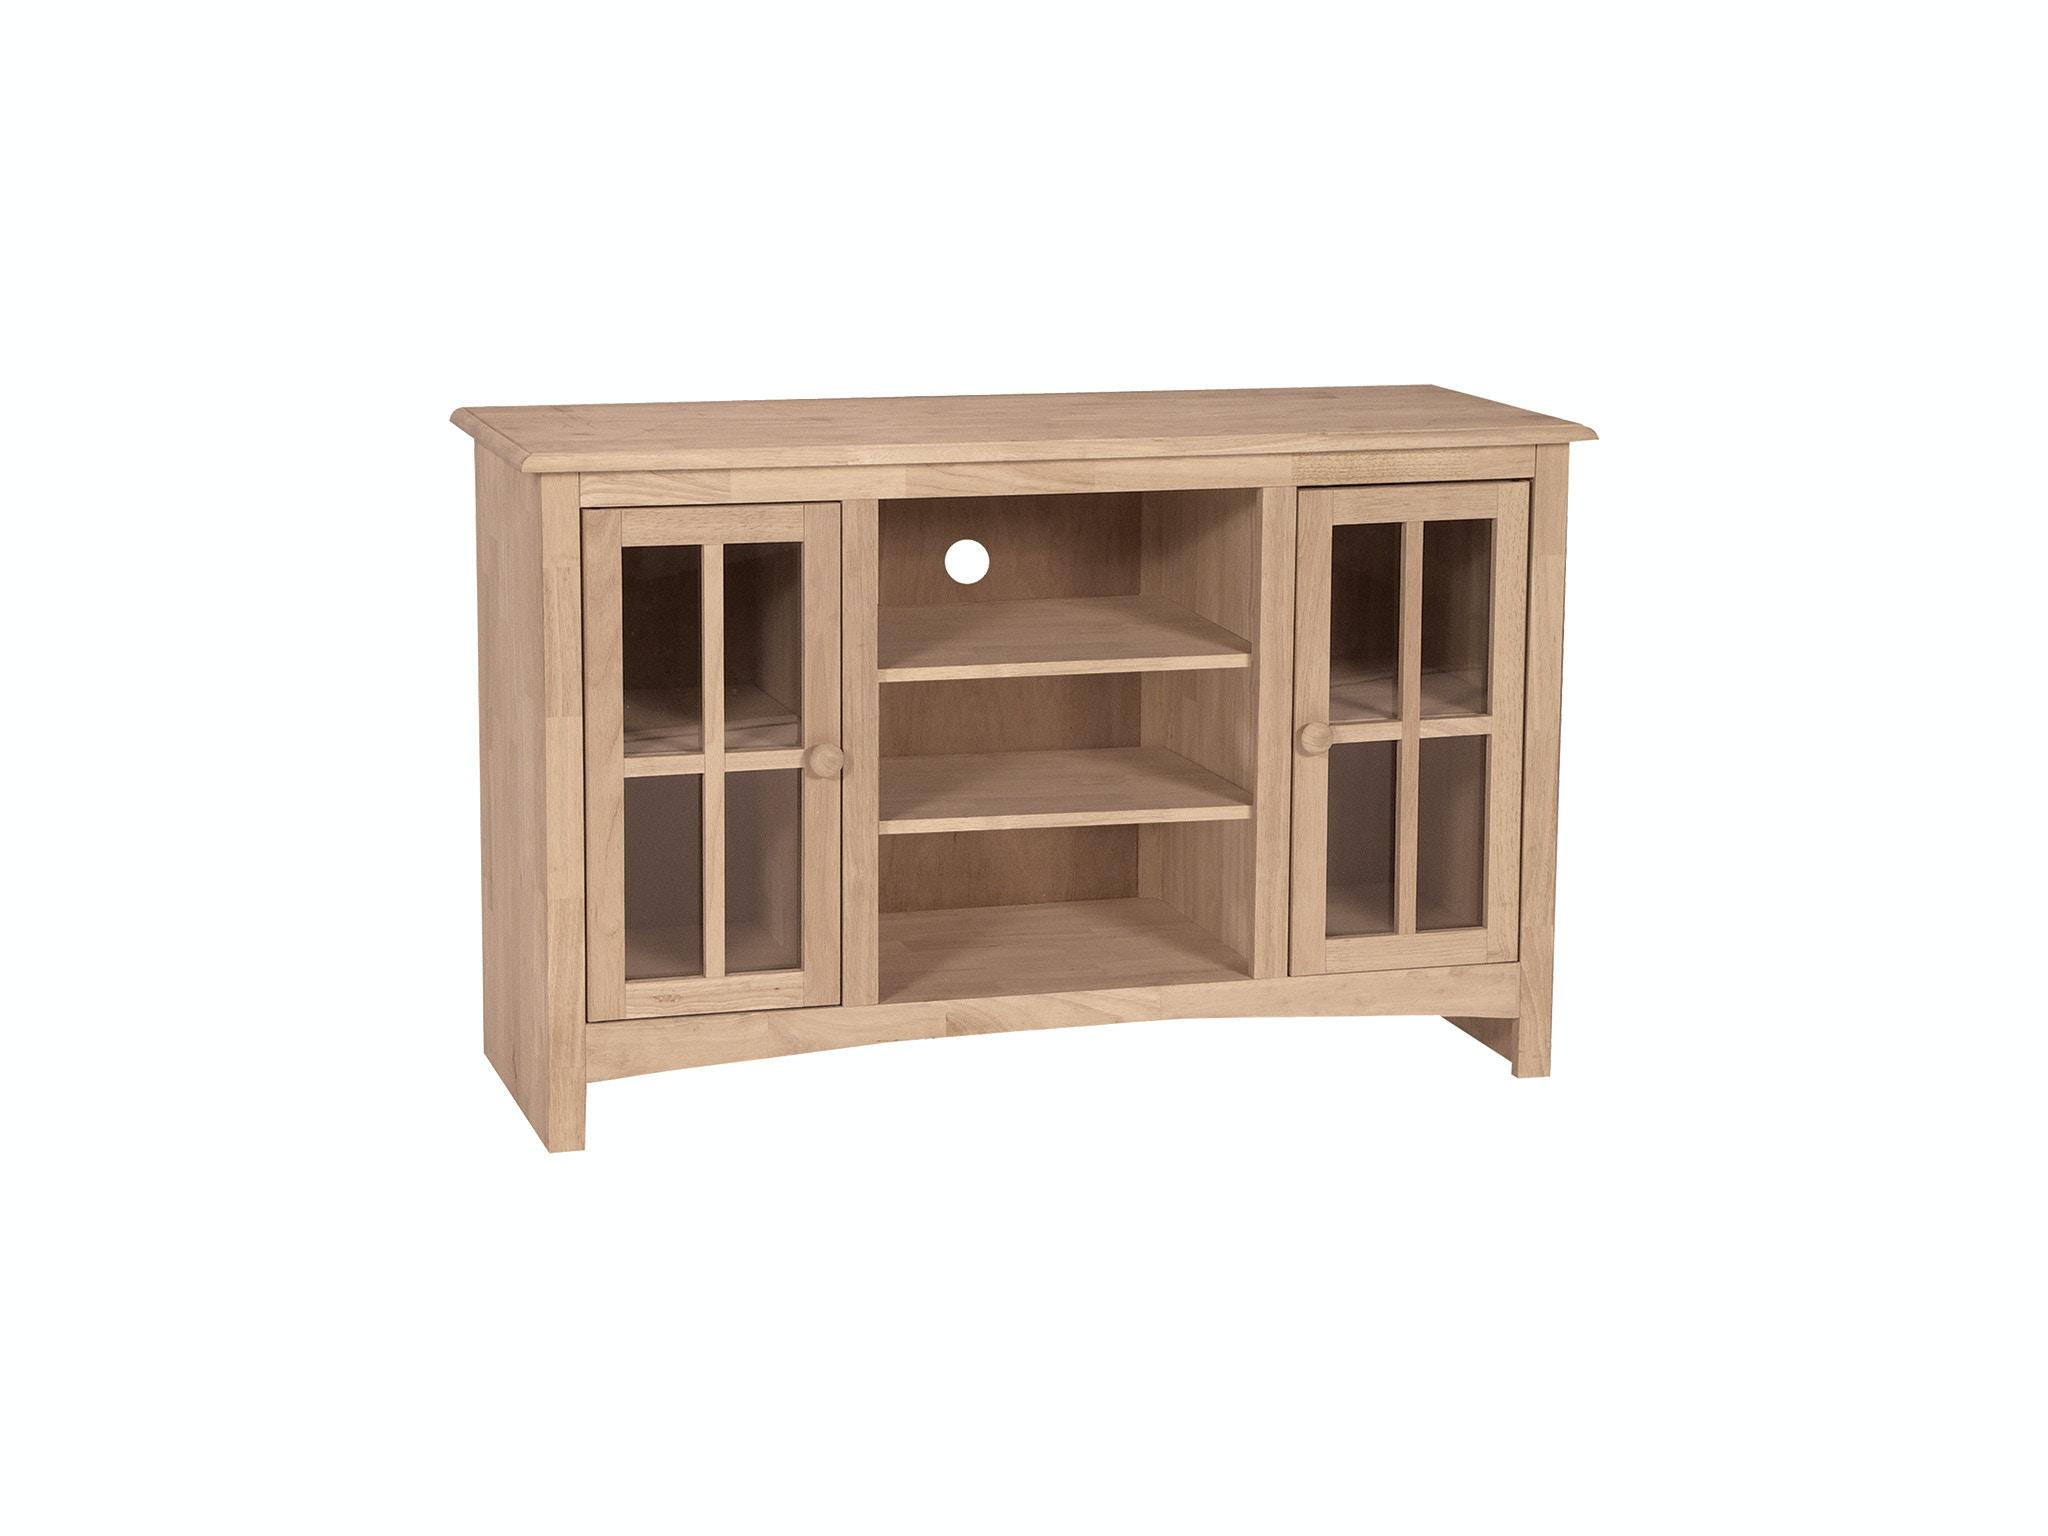 John Thomas Home Entertainment 48'' TV Stand<br><br>Four adjustable shelves